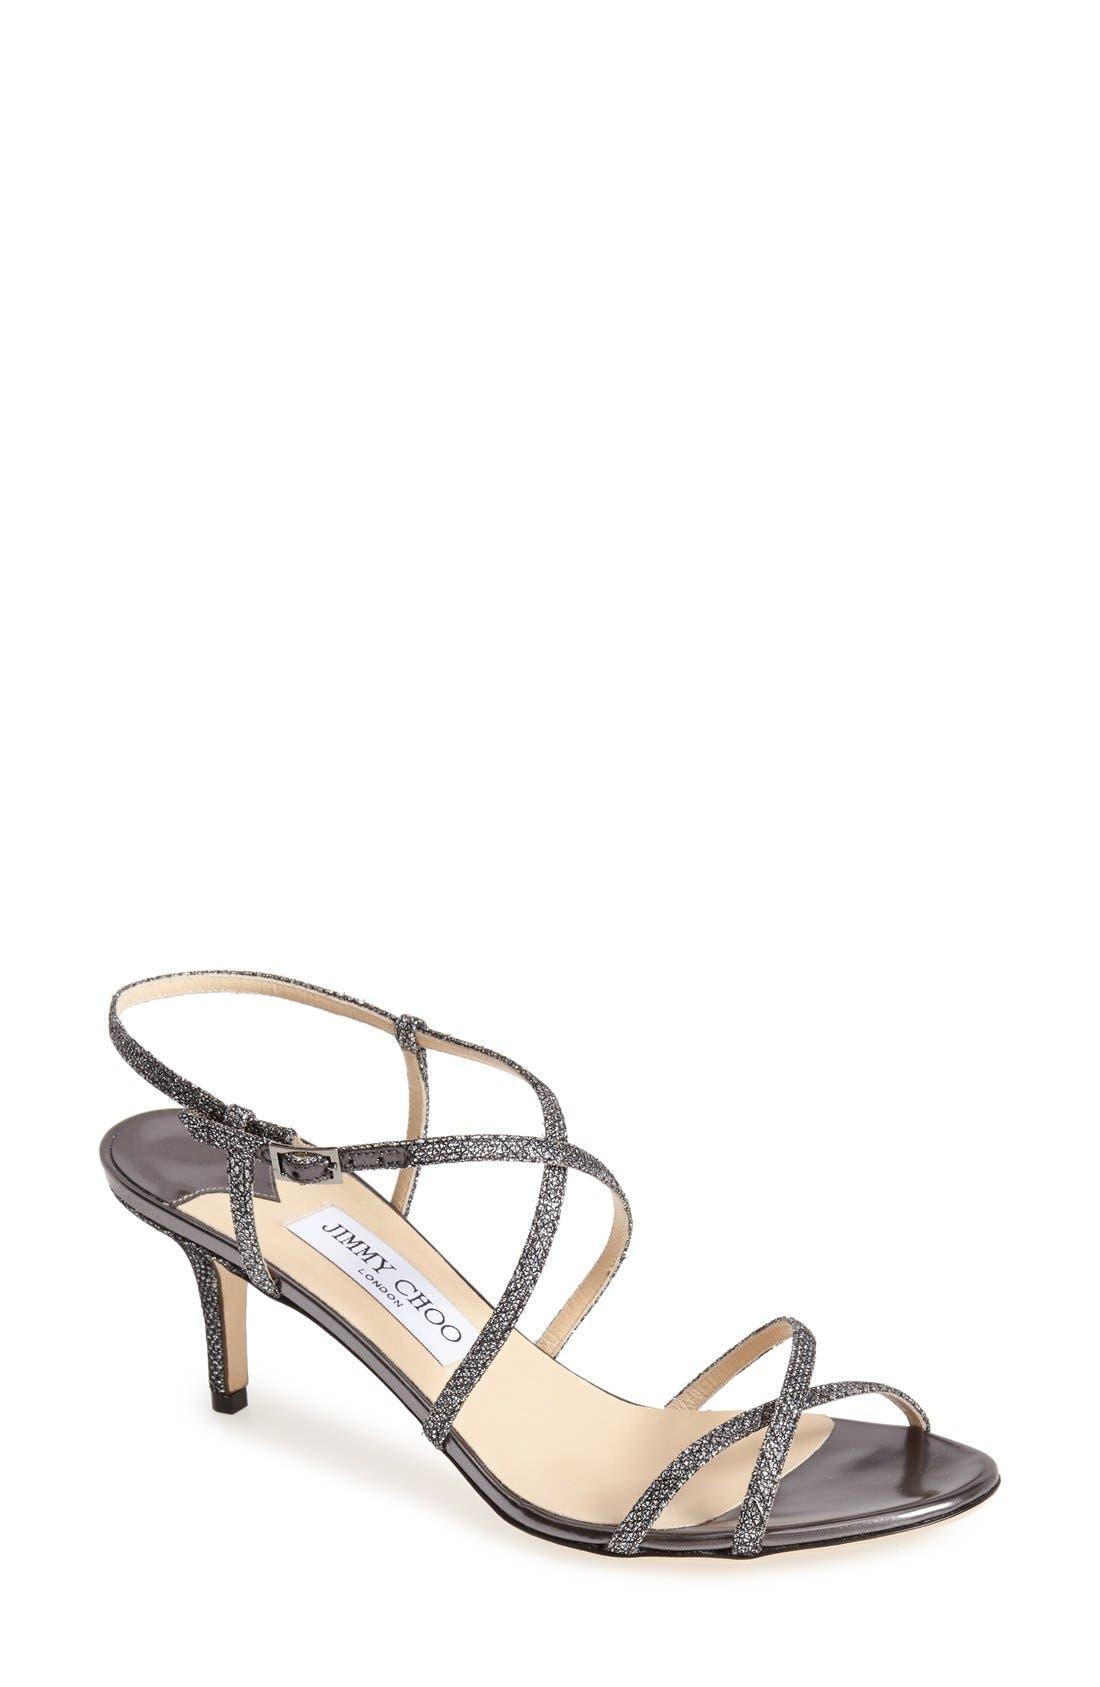 Main Image - Jimmy Choo 'Elisa' Glitter Strap Sandal (Women)